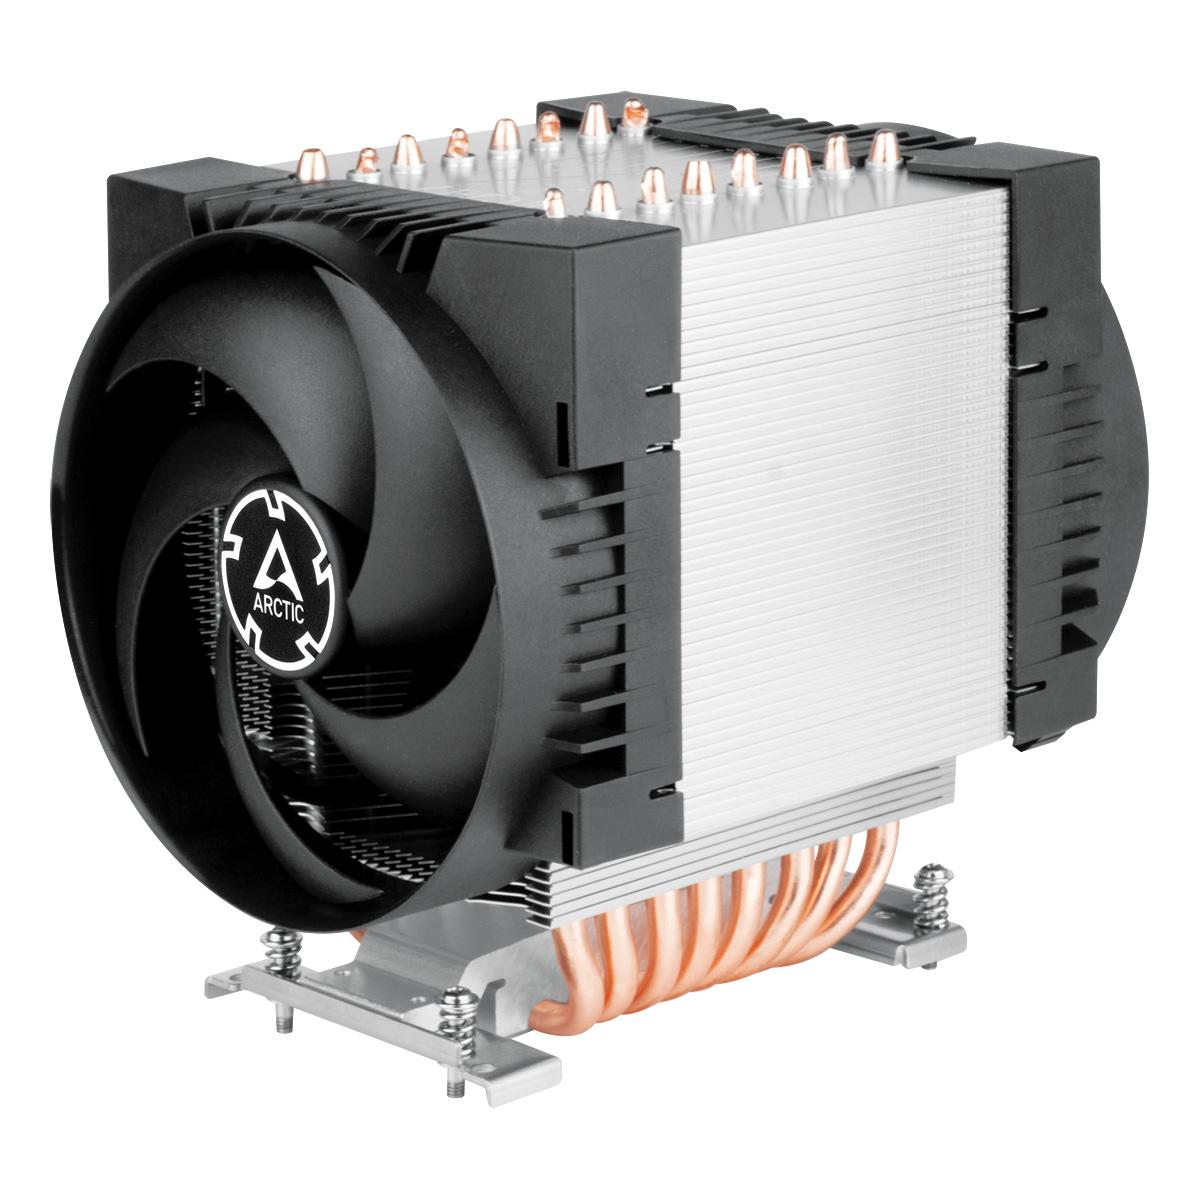 ARCTIC Freezer 4U SP3 - CPU Cooler for AMD socket